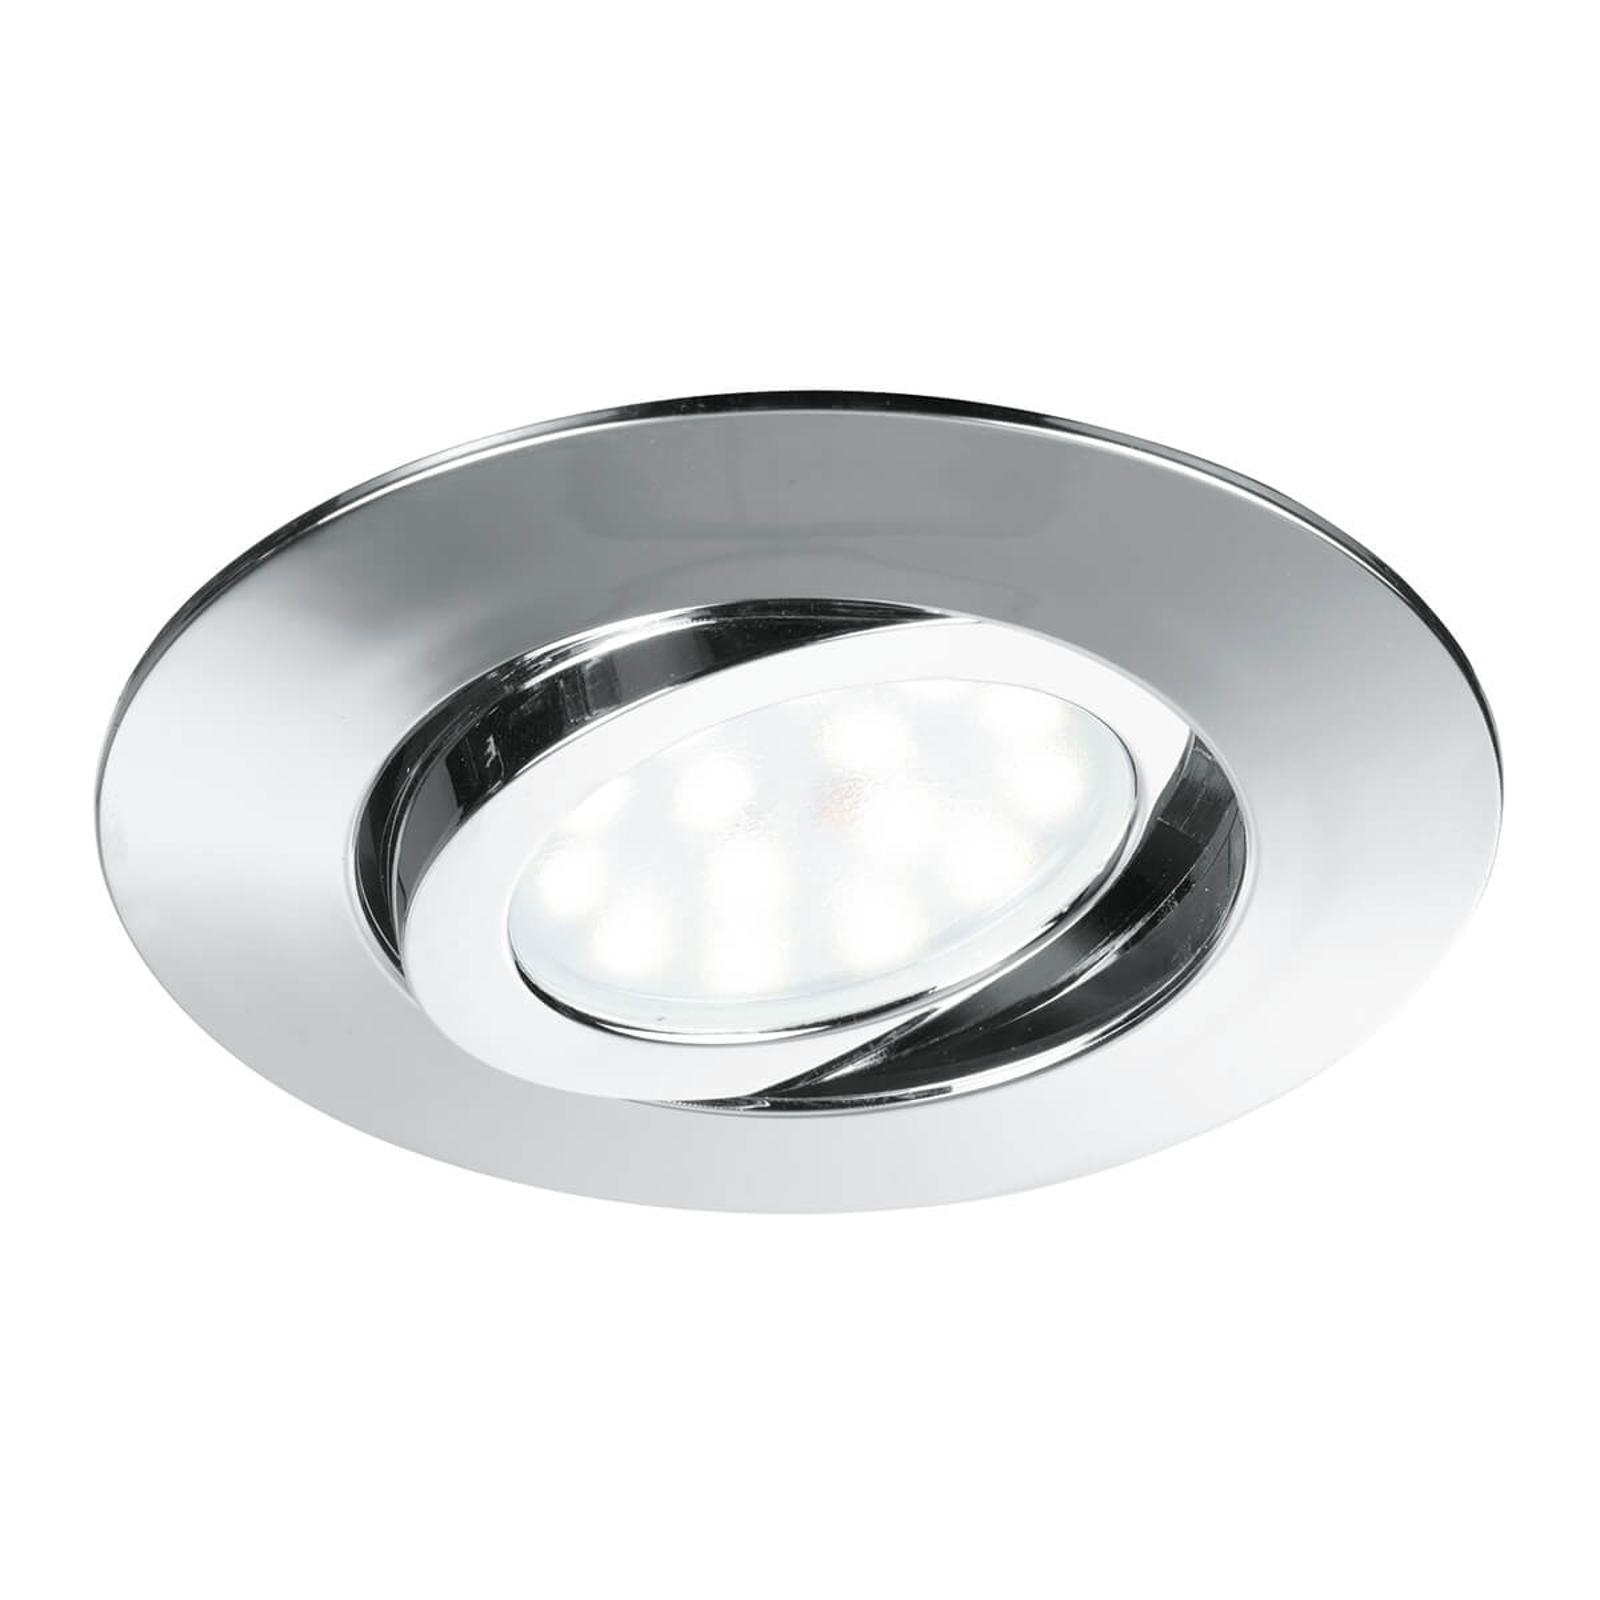 Zenit - spot LED da incasso a soffitto, cromo